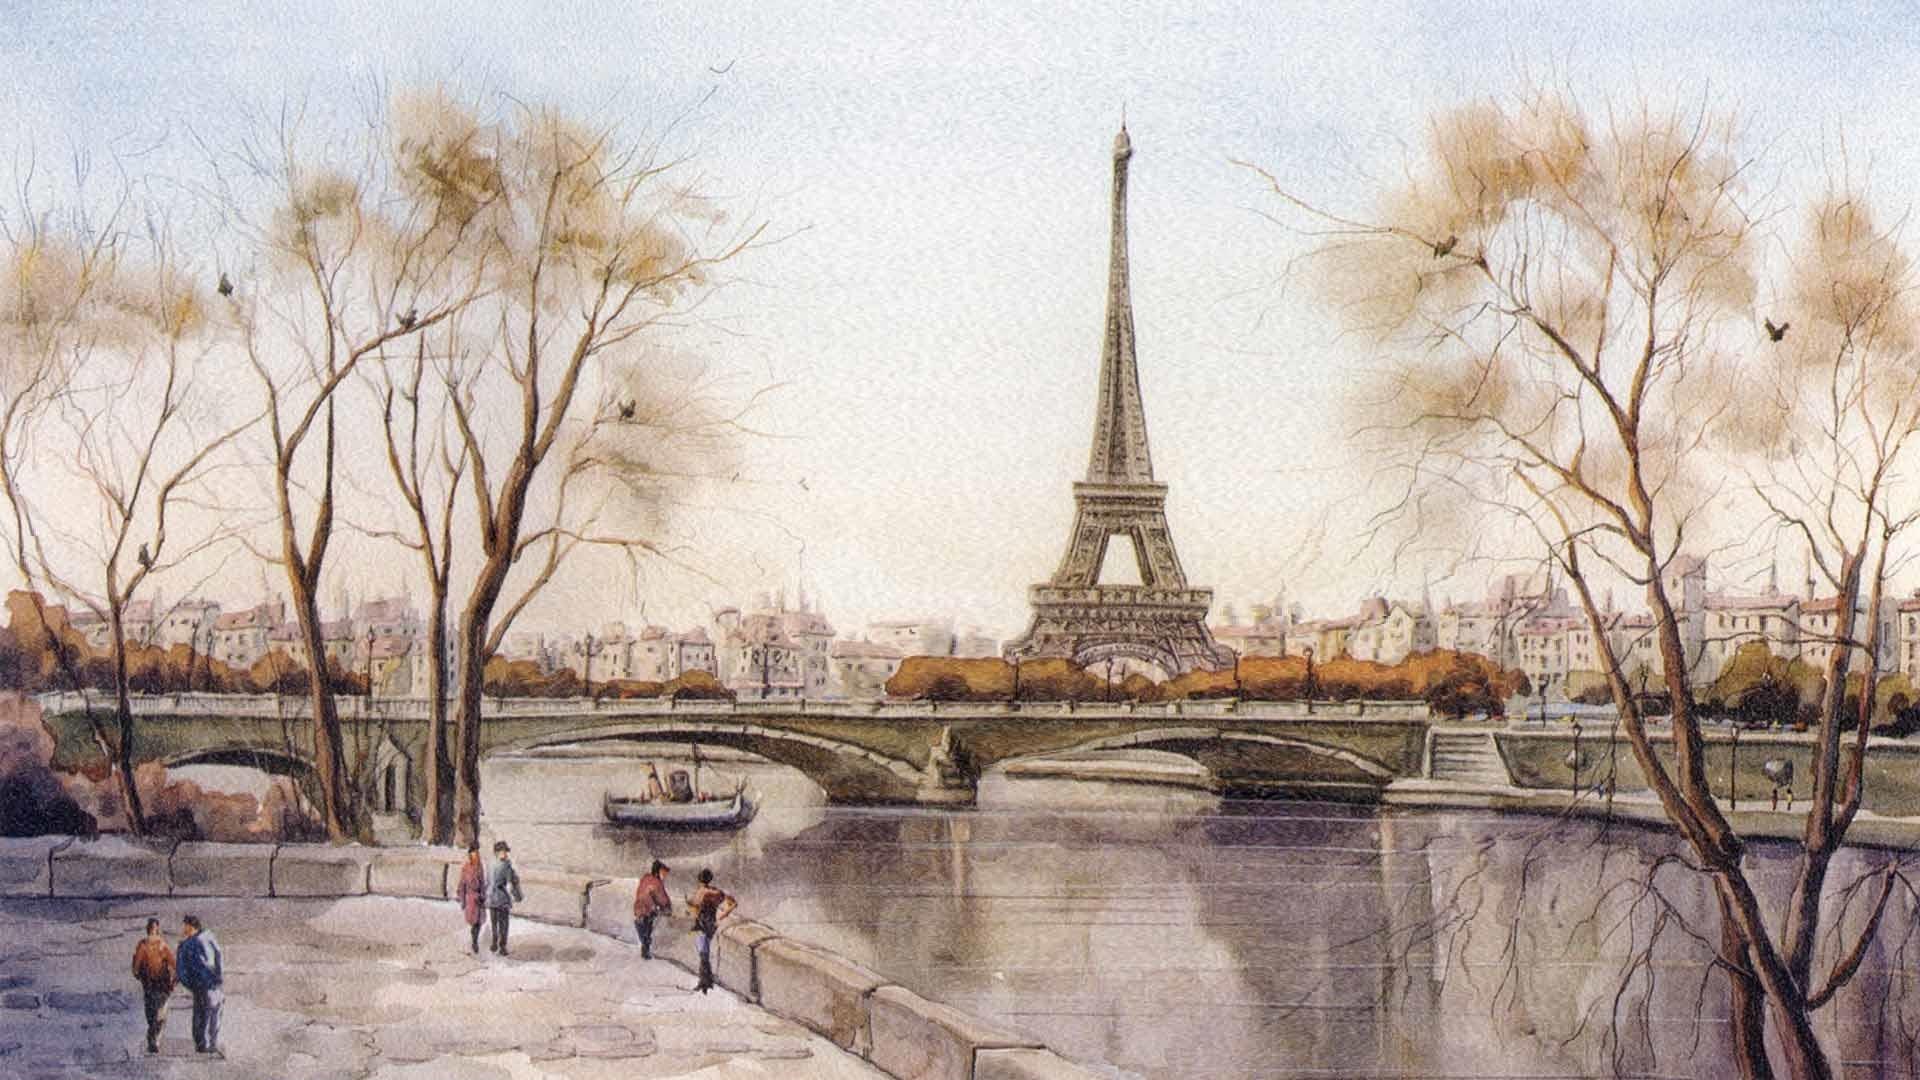 Eiffel Tower Art desktop wallpaper hd